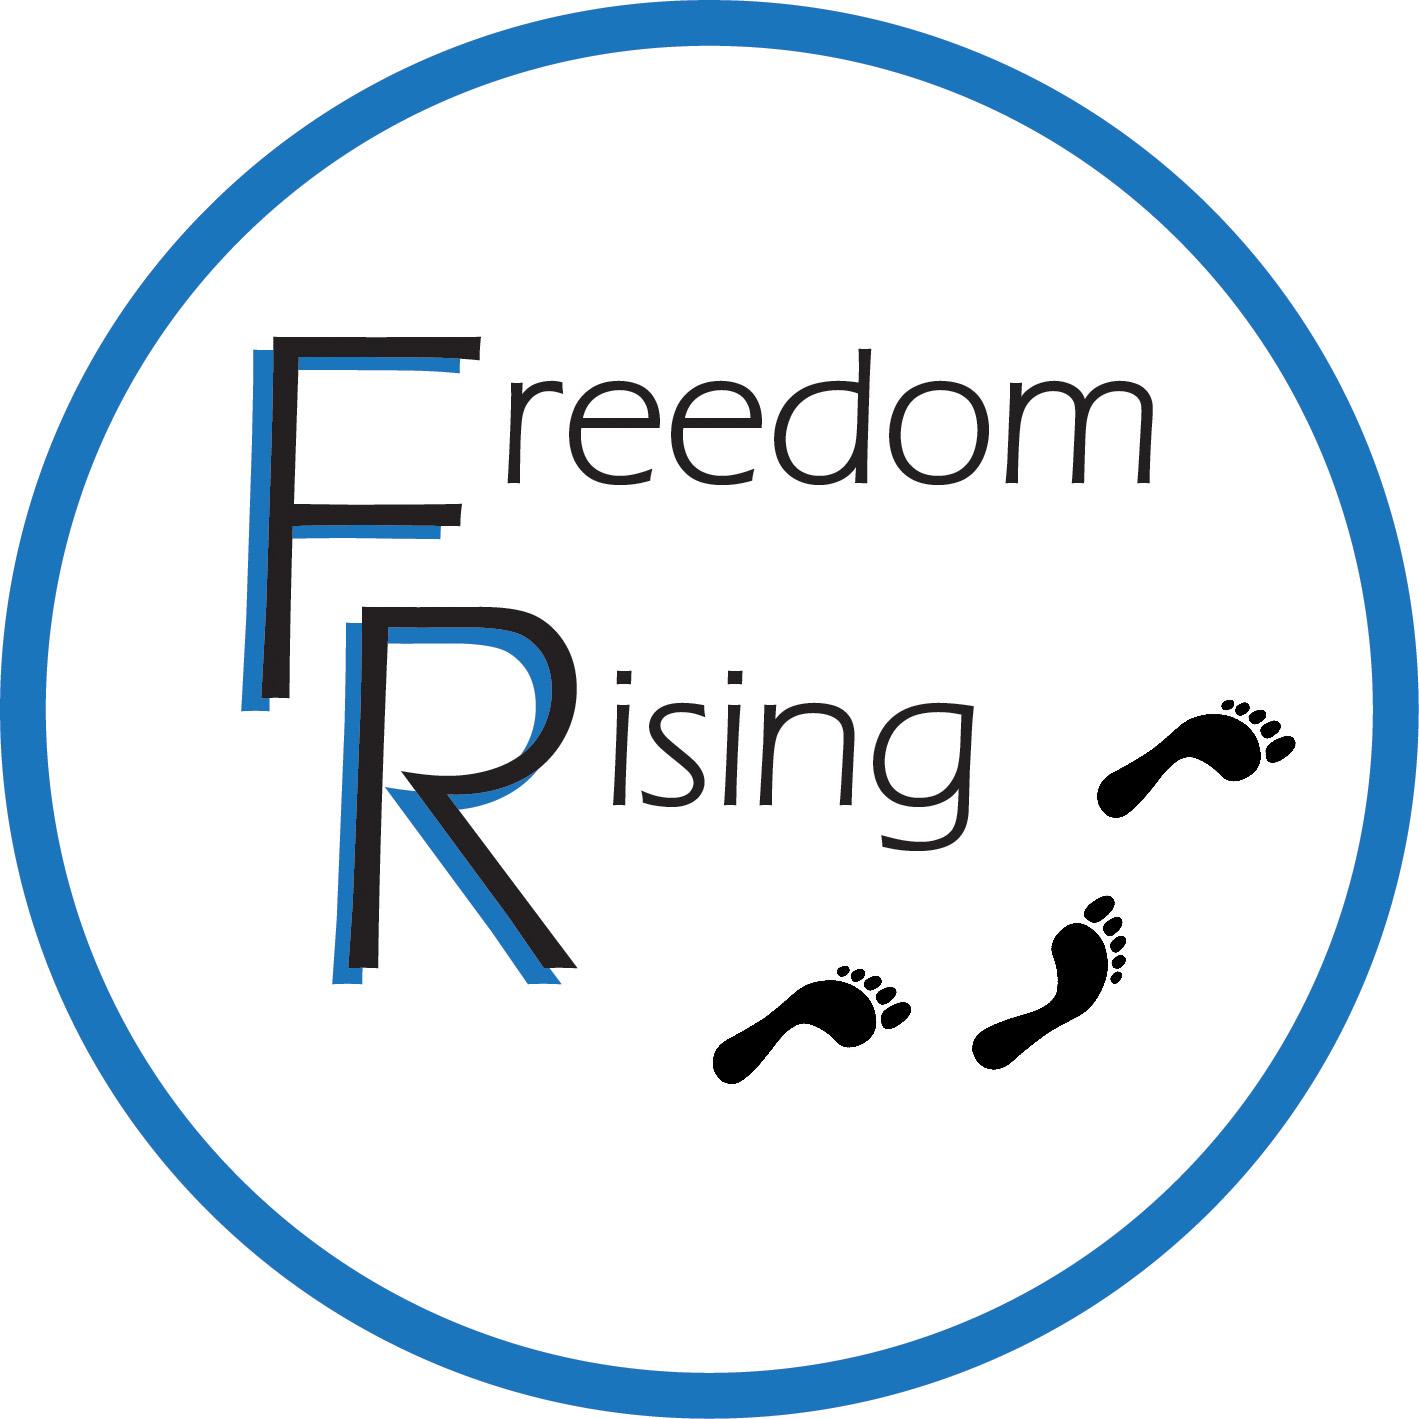 Freedom Rising ENRICHMENT Grant